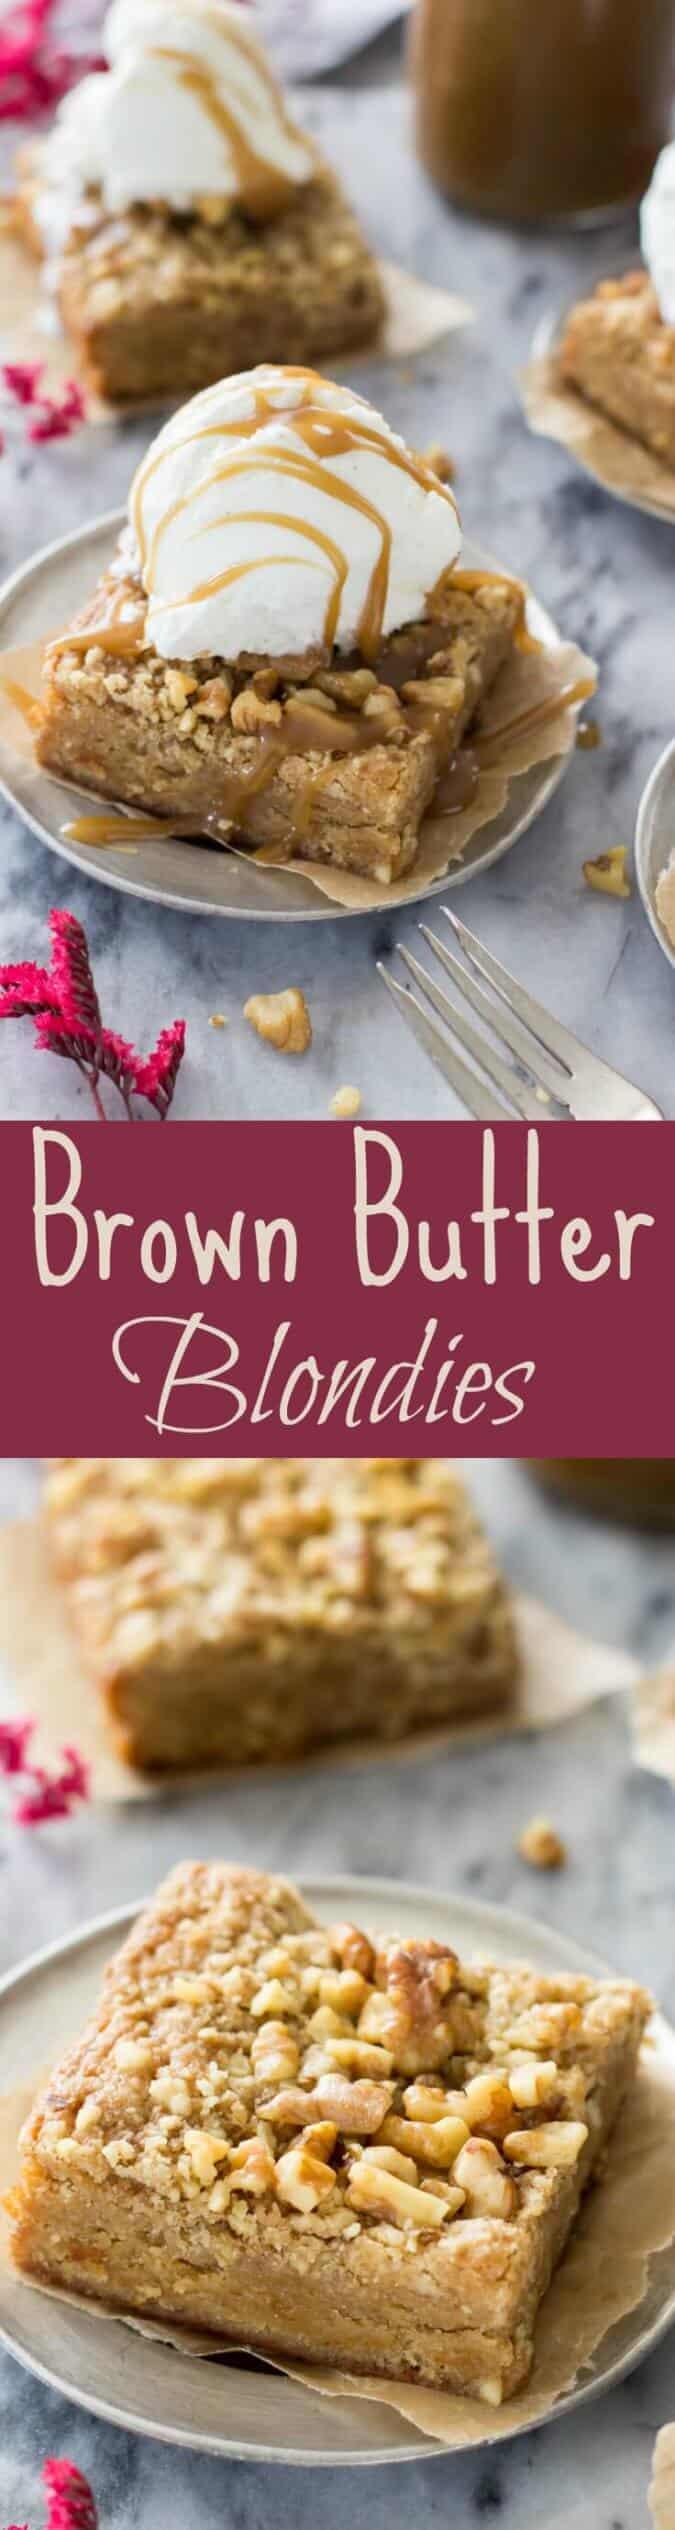 brown-butter-blondies-with-walnut-crumble-sugarspunrun